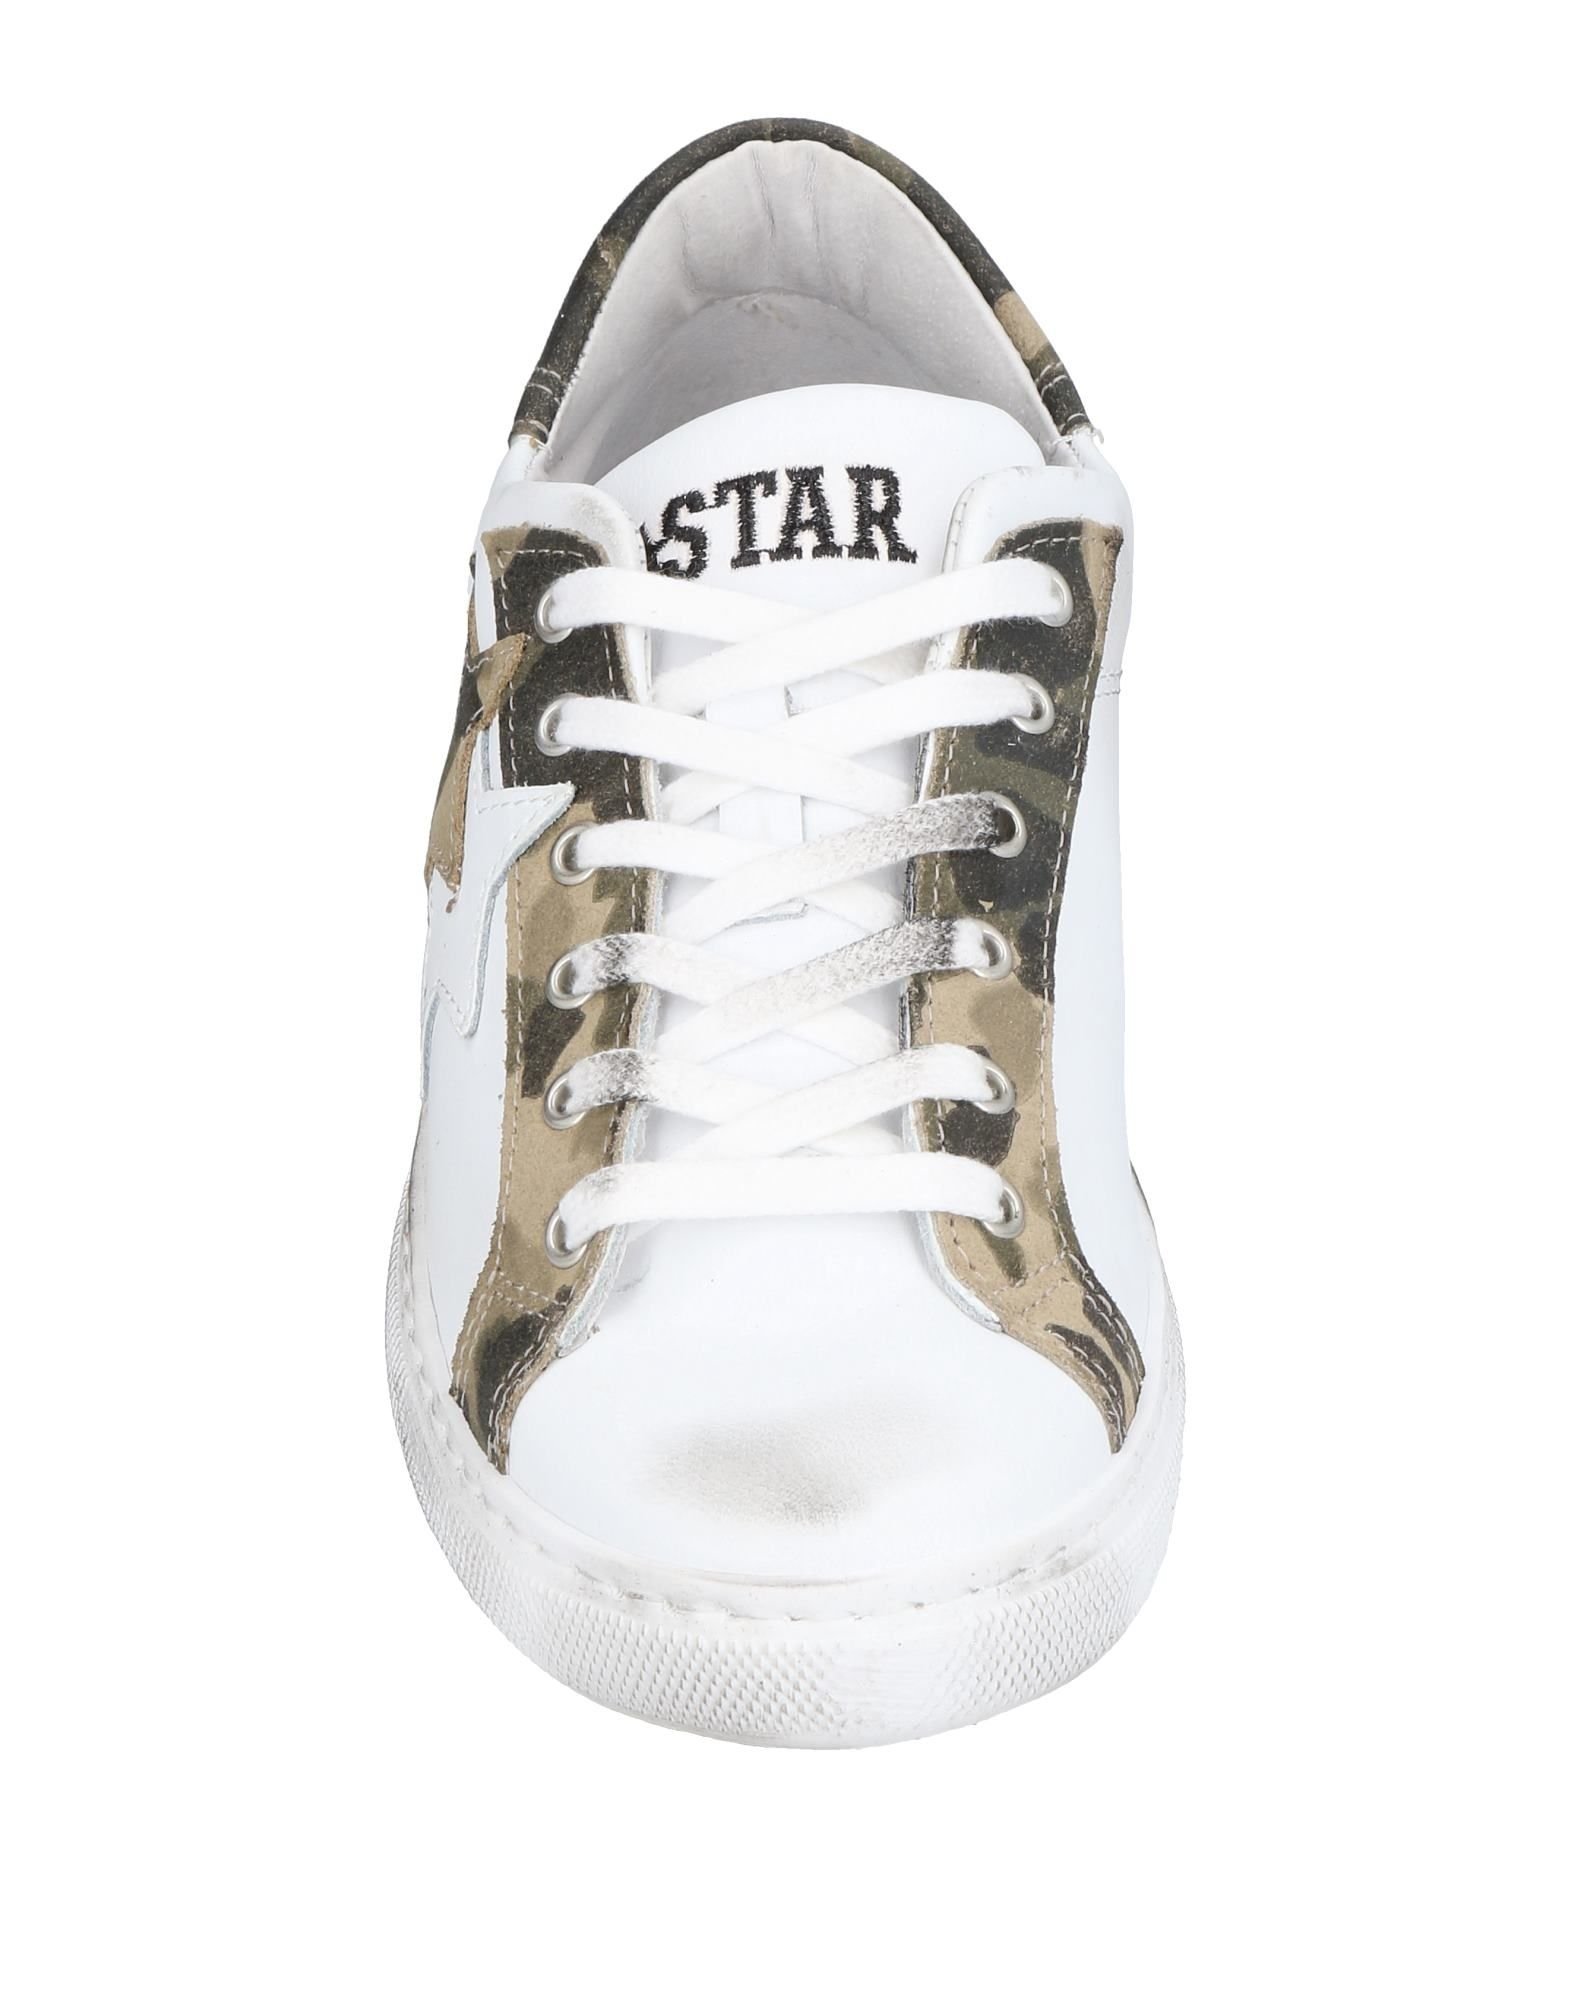 2Star Sneakers Damen  11453500SI Schuhe Gute Qualität beliebte Schuhe 11453500SI 2f72dc